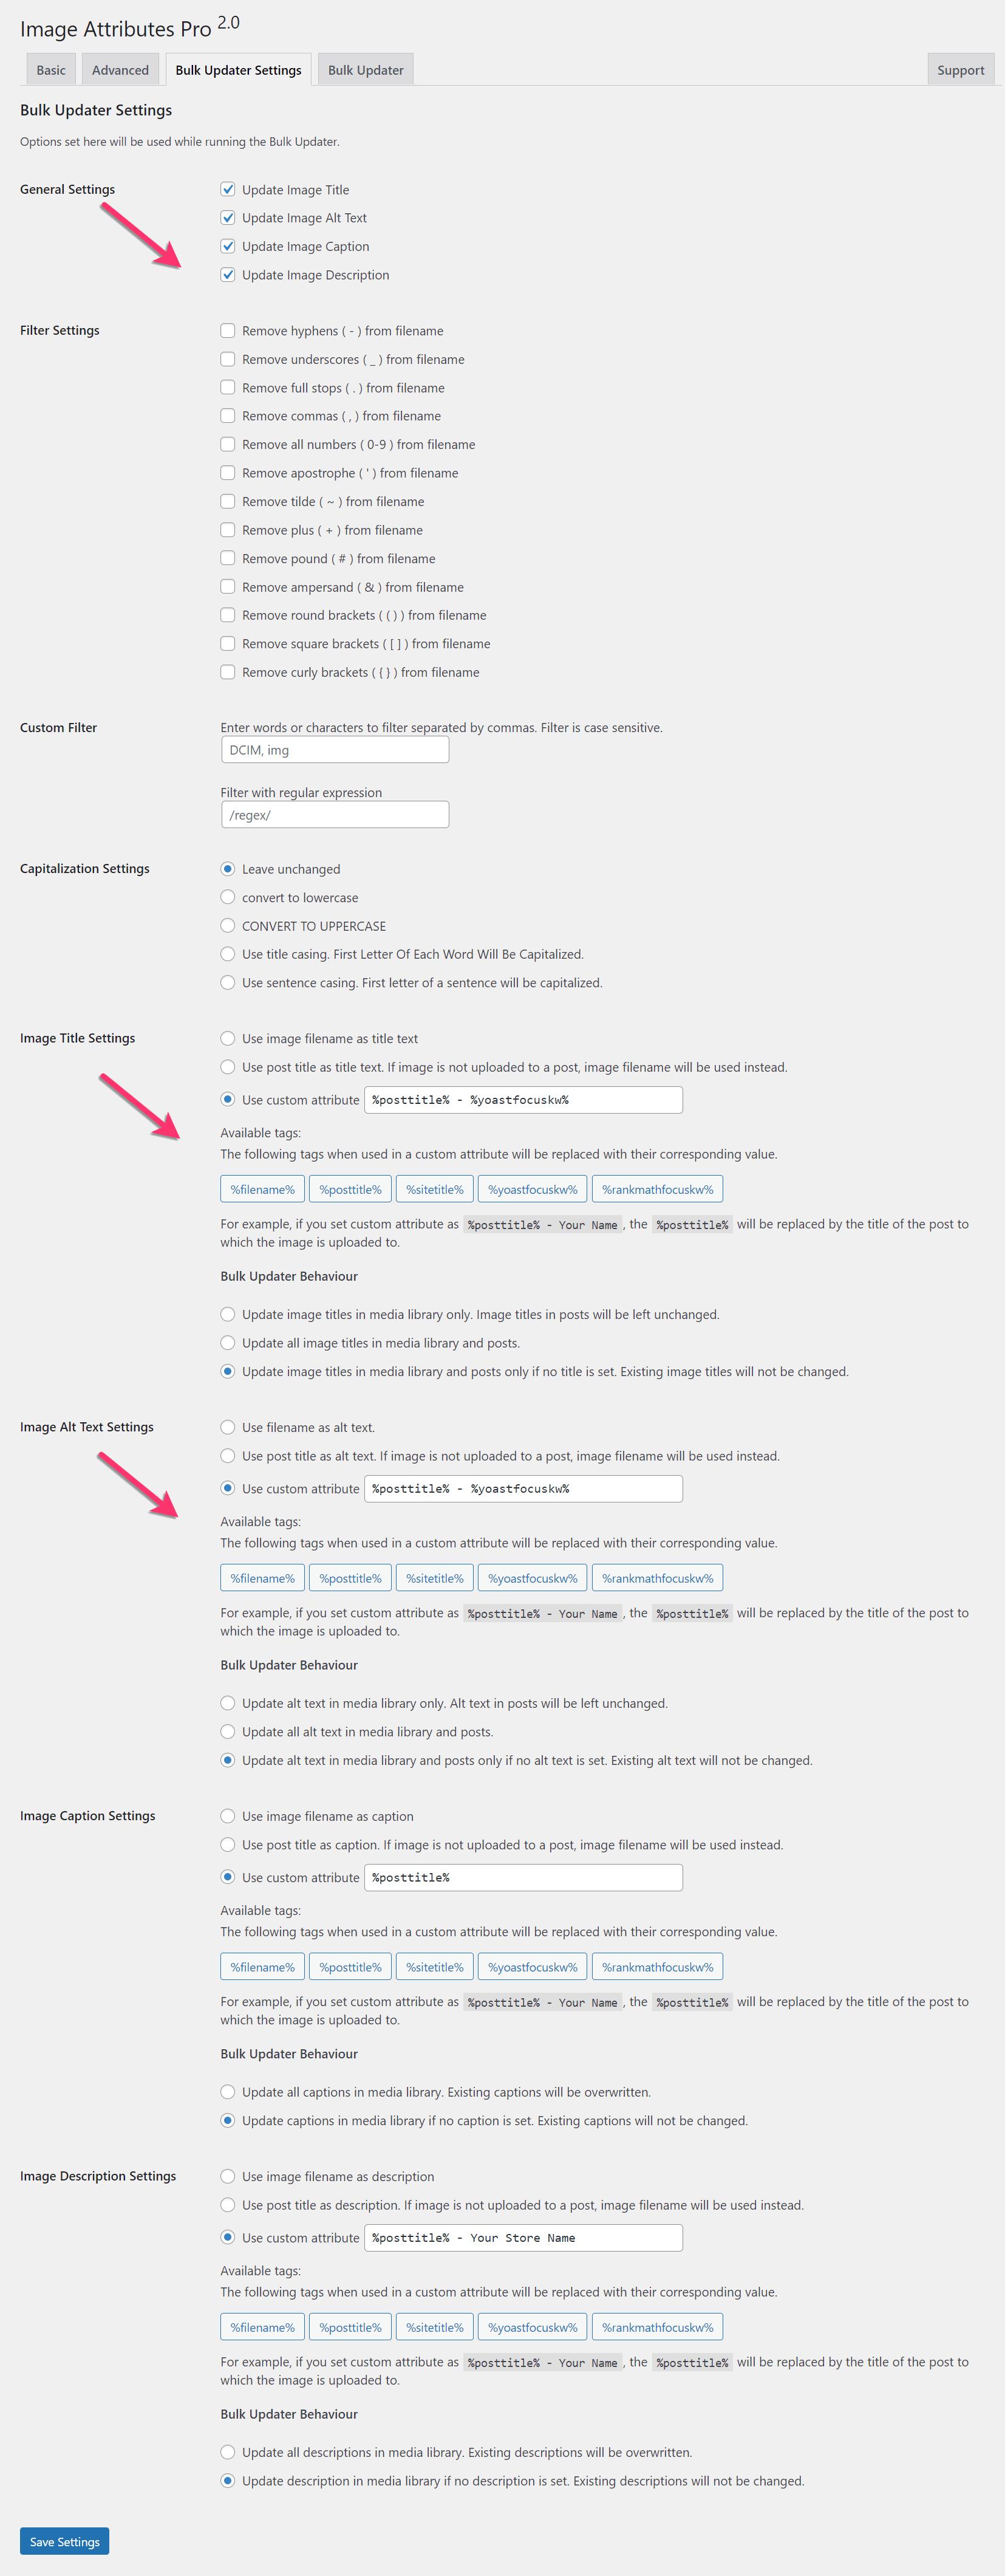 Image Attributes Pro Bulk Updater Settings For WooCommerce